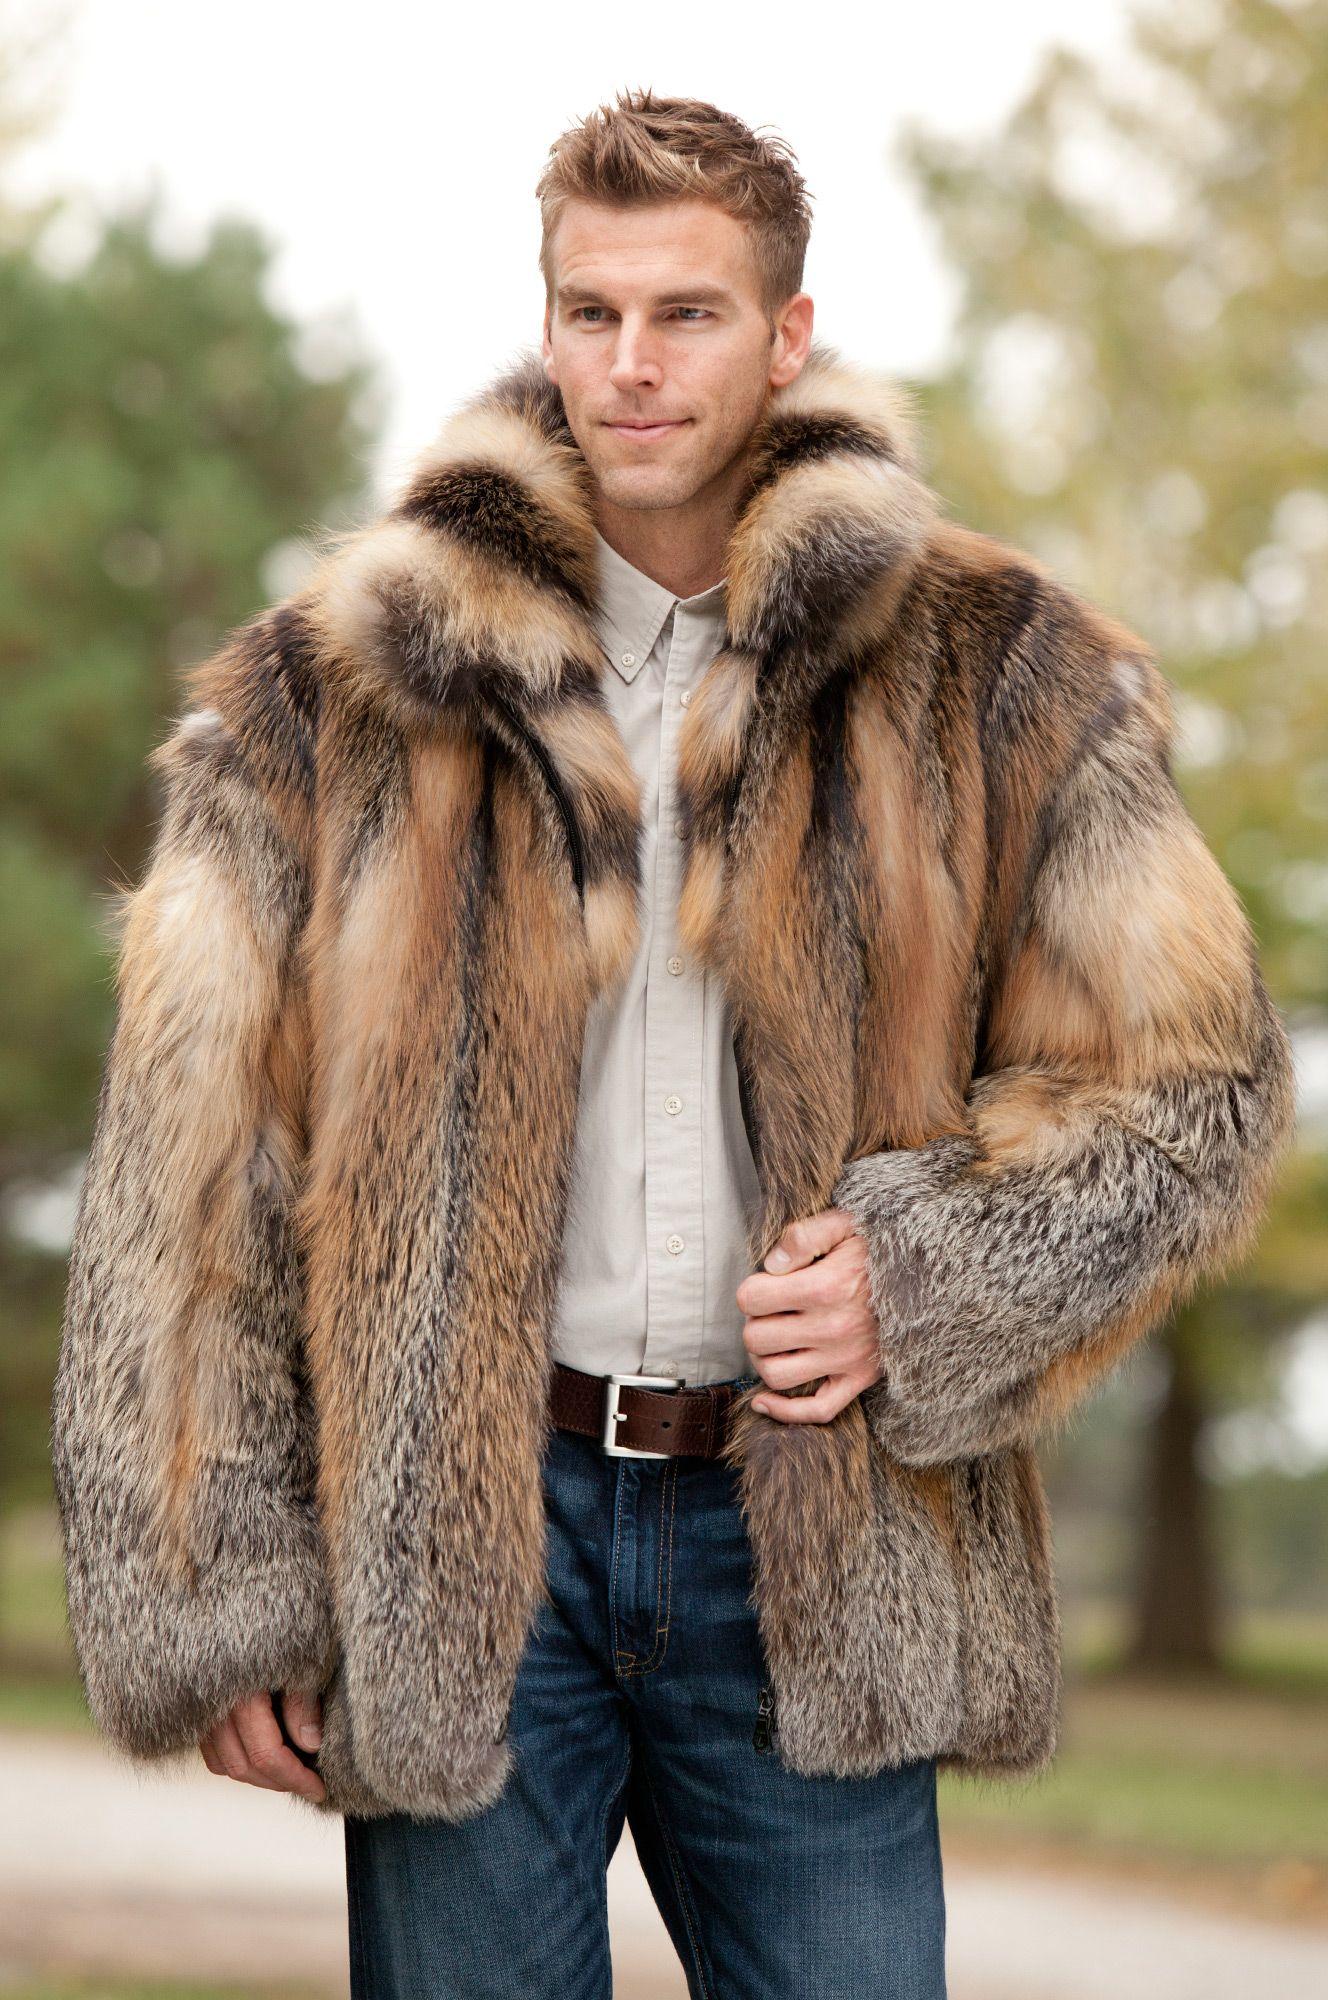 BIG BEAR Fur Coat Burning Man Playa Jacket Mens Costume